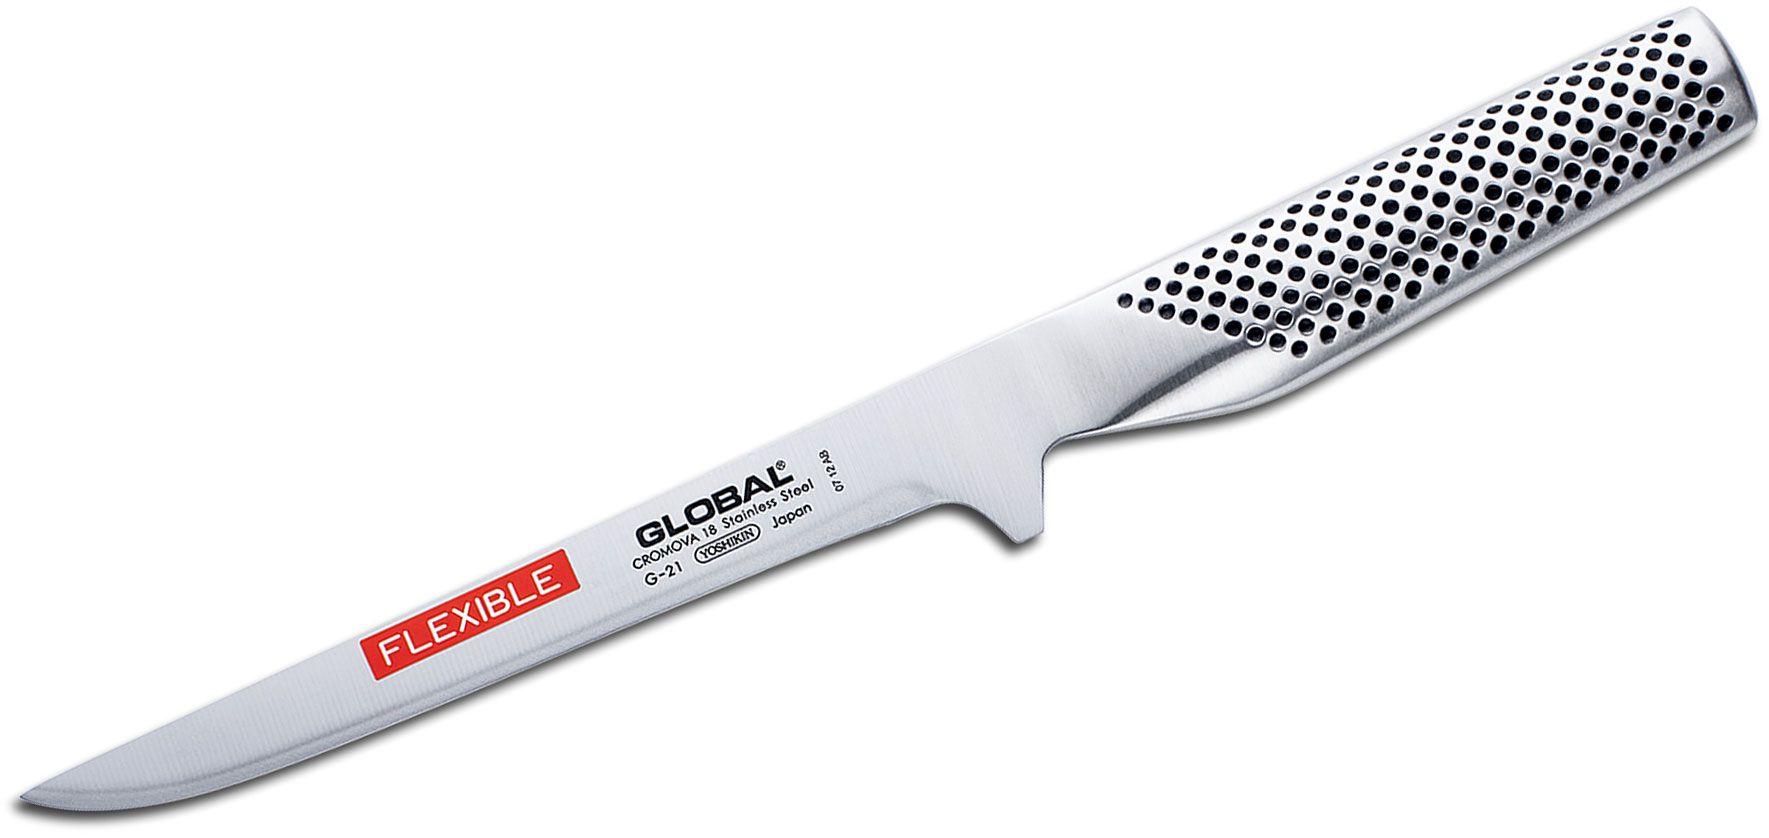 Global G-21 Classic 6.25 inch Flexible Boning Knife